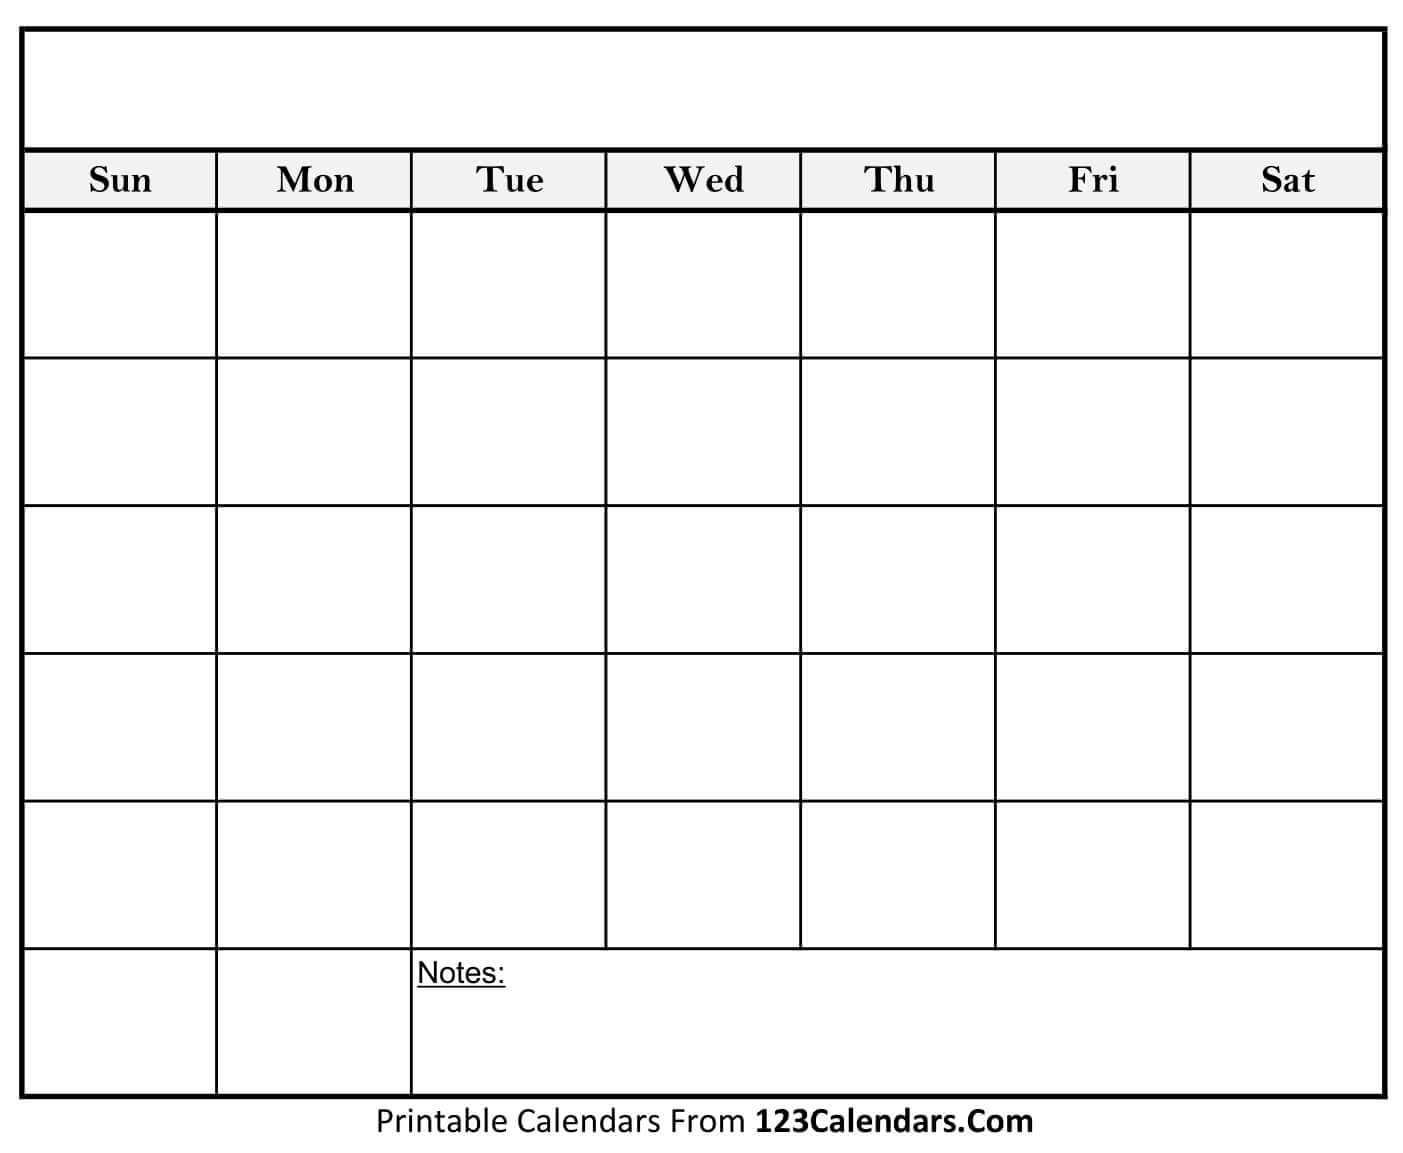 Printable Blank Calendar Templates - 123Calendars intended for Printable Calendar Template With Lines